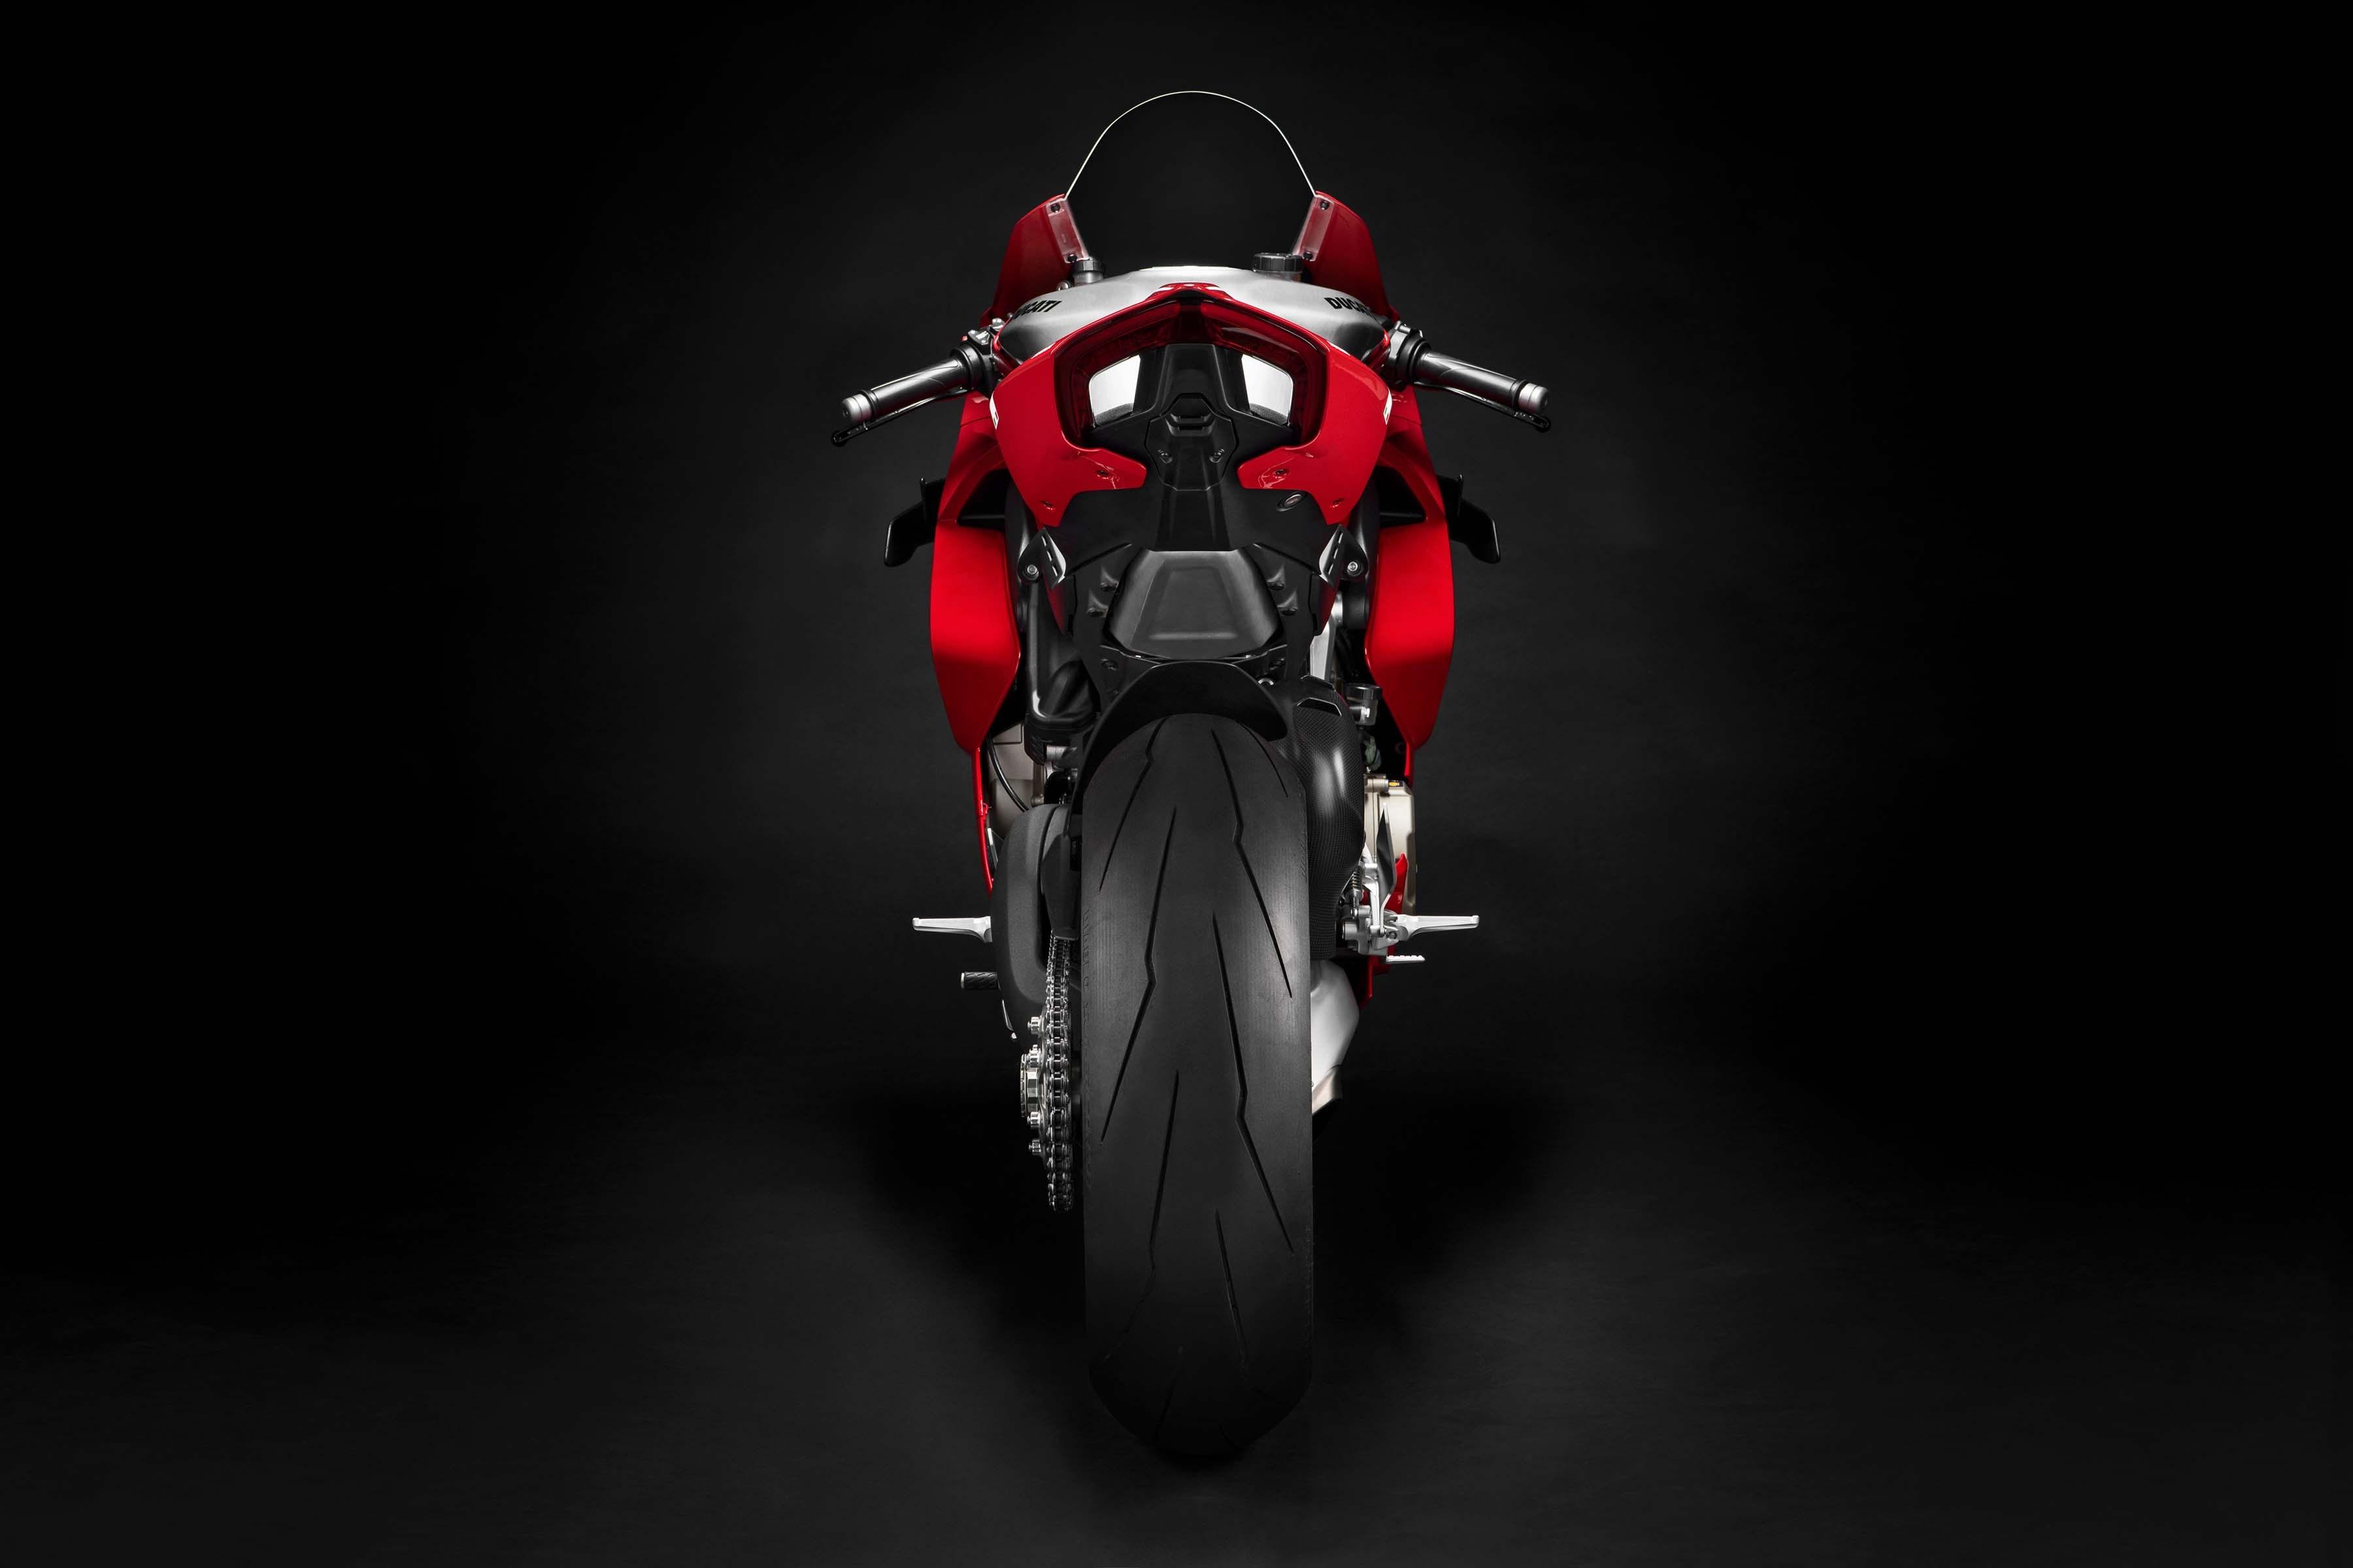 2019 Ducati Panigale V4 R 4 Bikesrepublic